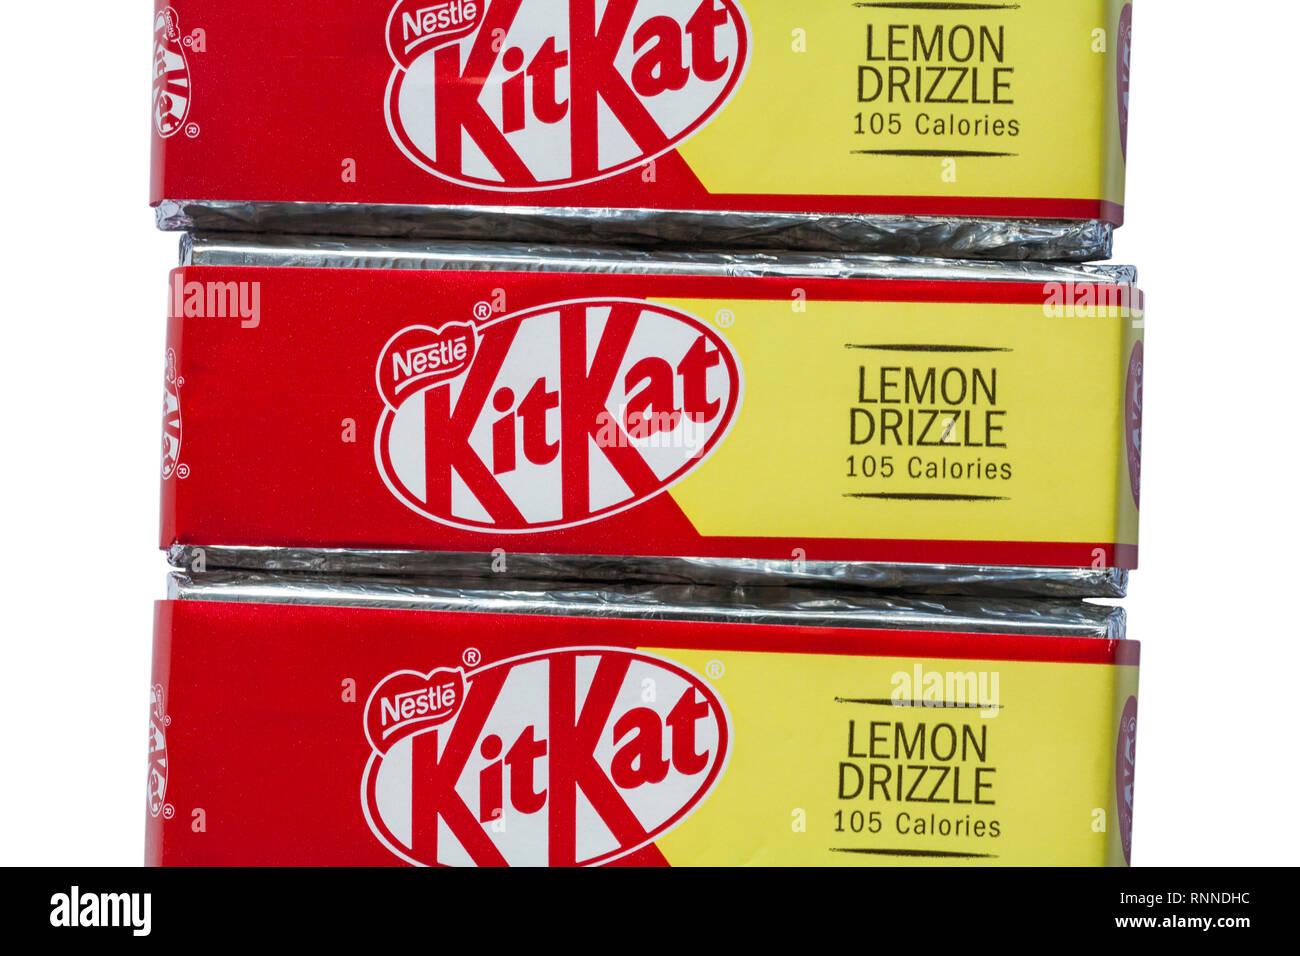 Nestle lemon drizzle KitKat bars set on white background - Kit Kat - Stock Image